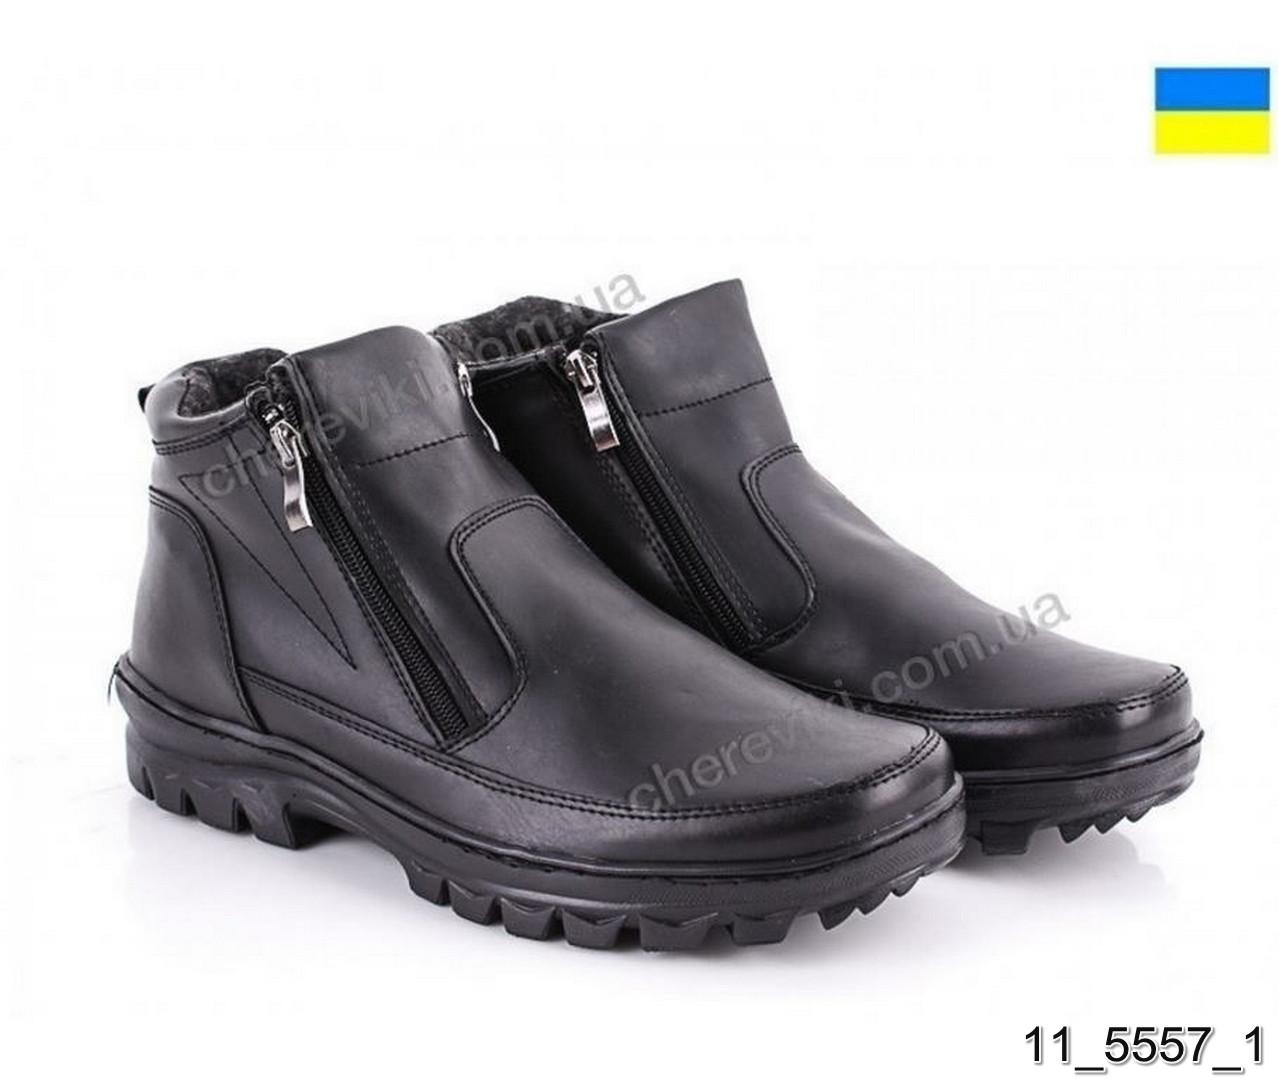 Ботинки paolla pilo Б-29 Чорний Еко кожа арт.11 Украина 40(р)